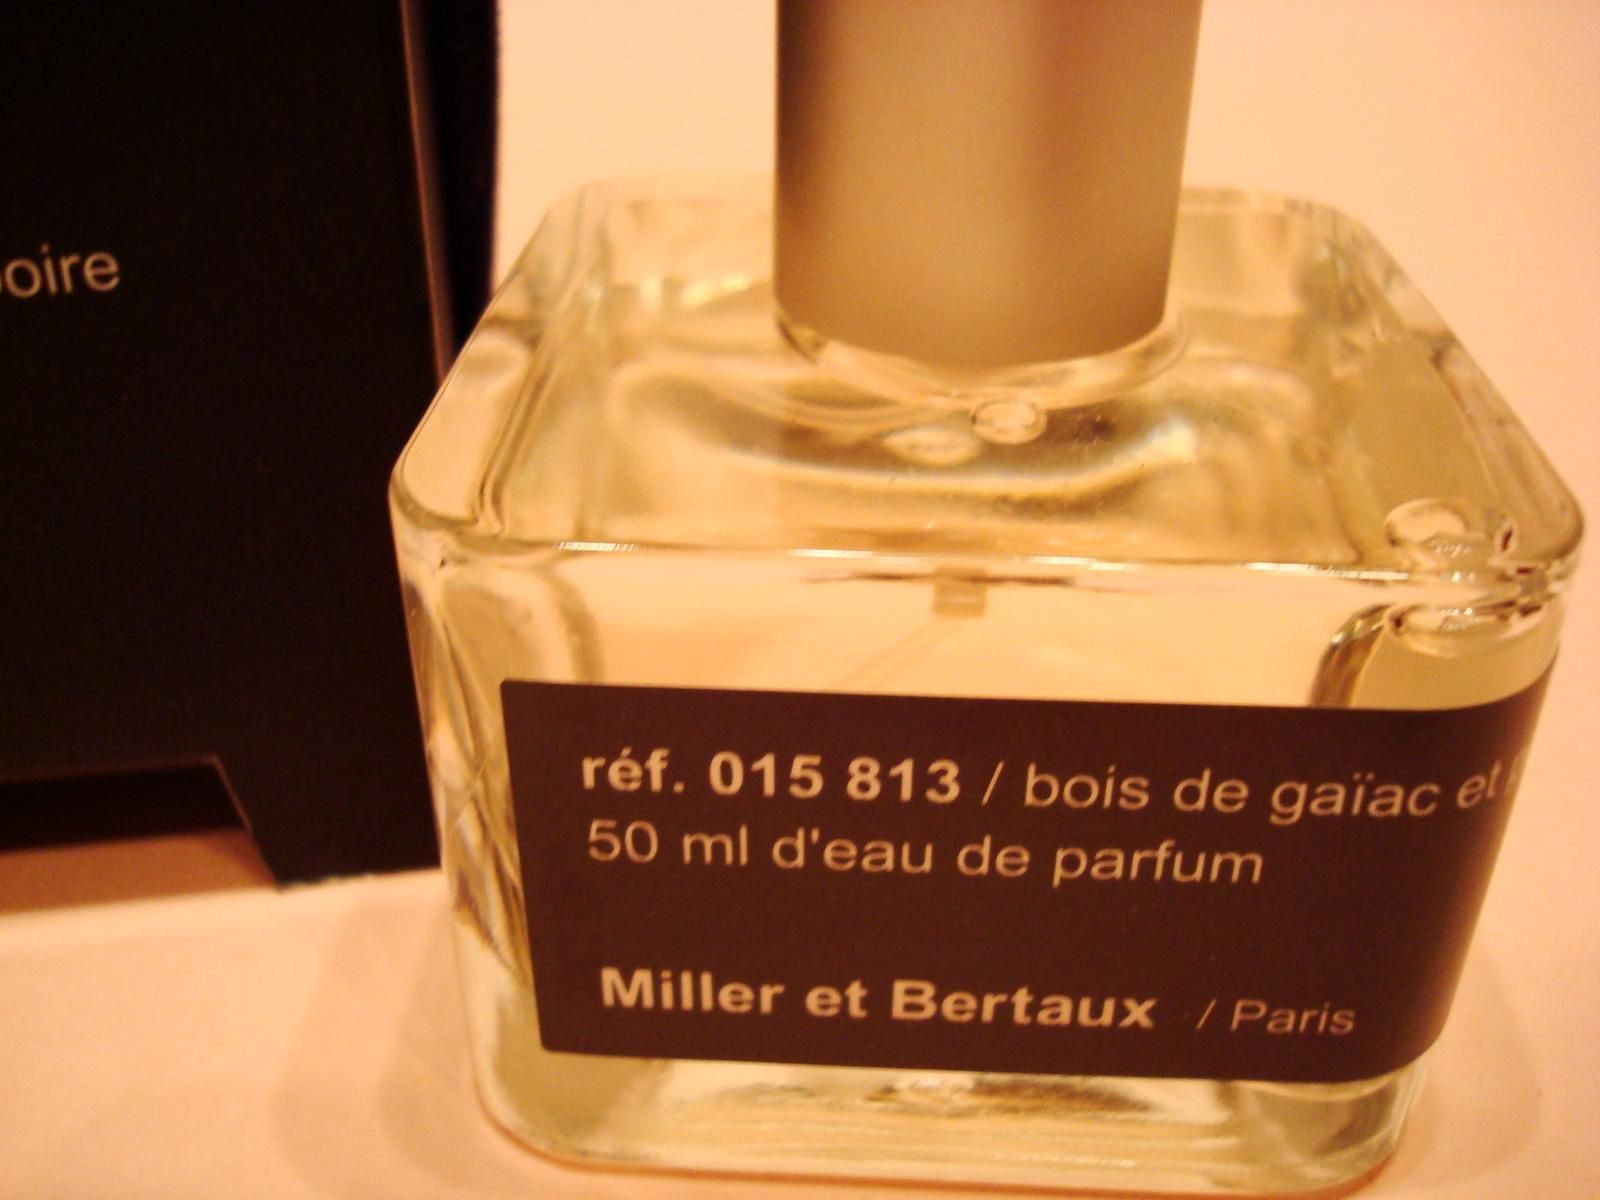 Miller et Bertaux オードパルファン(香水)50ml Bois de Gaiac et Poire for women and men 2006 「ミレー・エ・ベルトー」【2905】